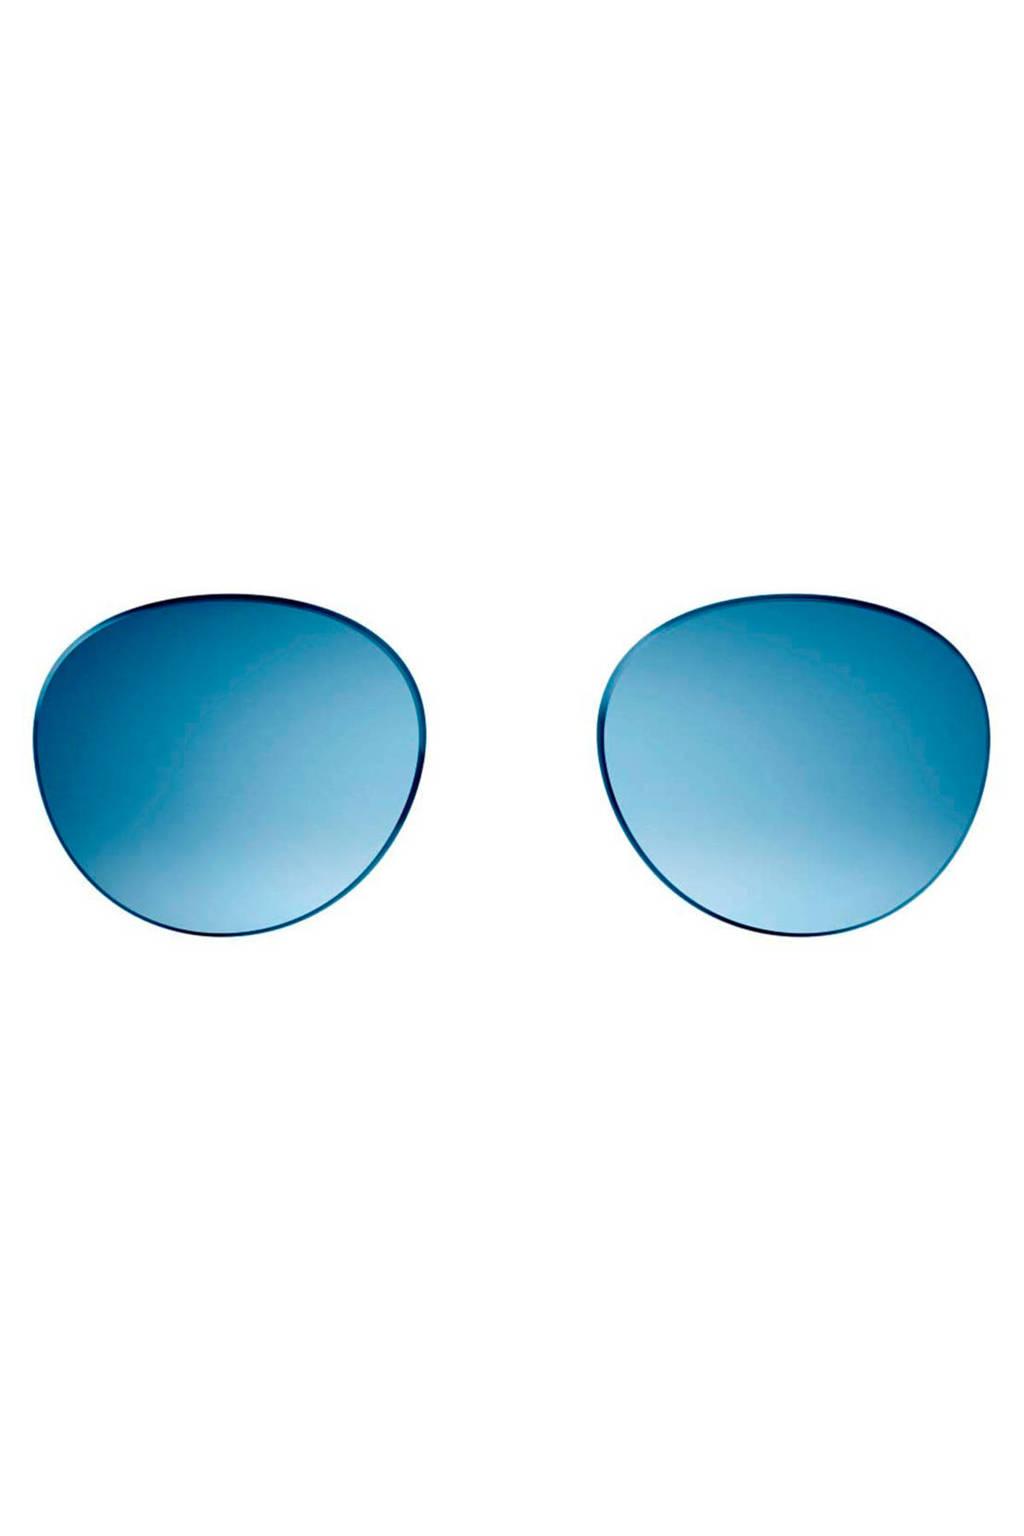 Bose LENSES RONDO Frame Rondo audiozonnebril lenzen (Blauw)